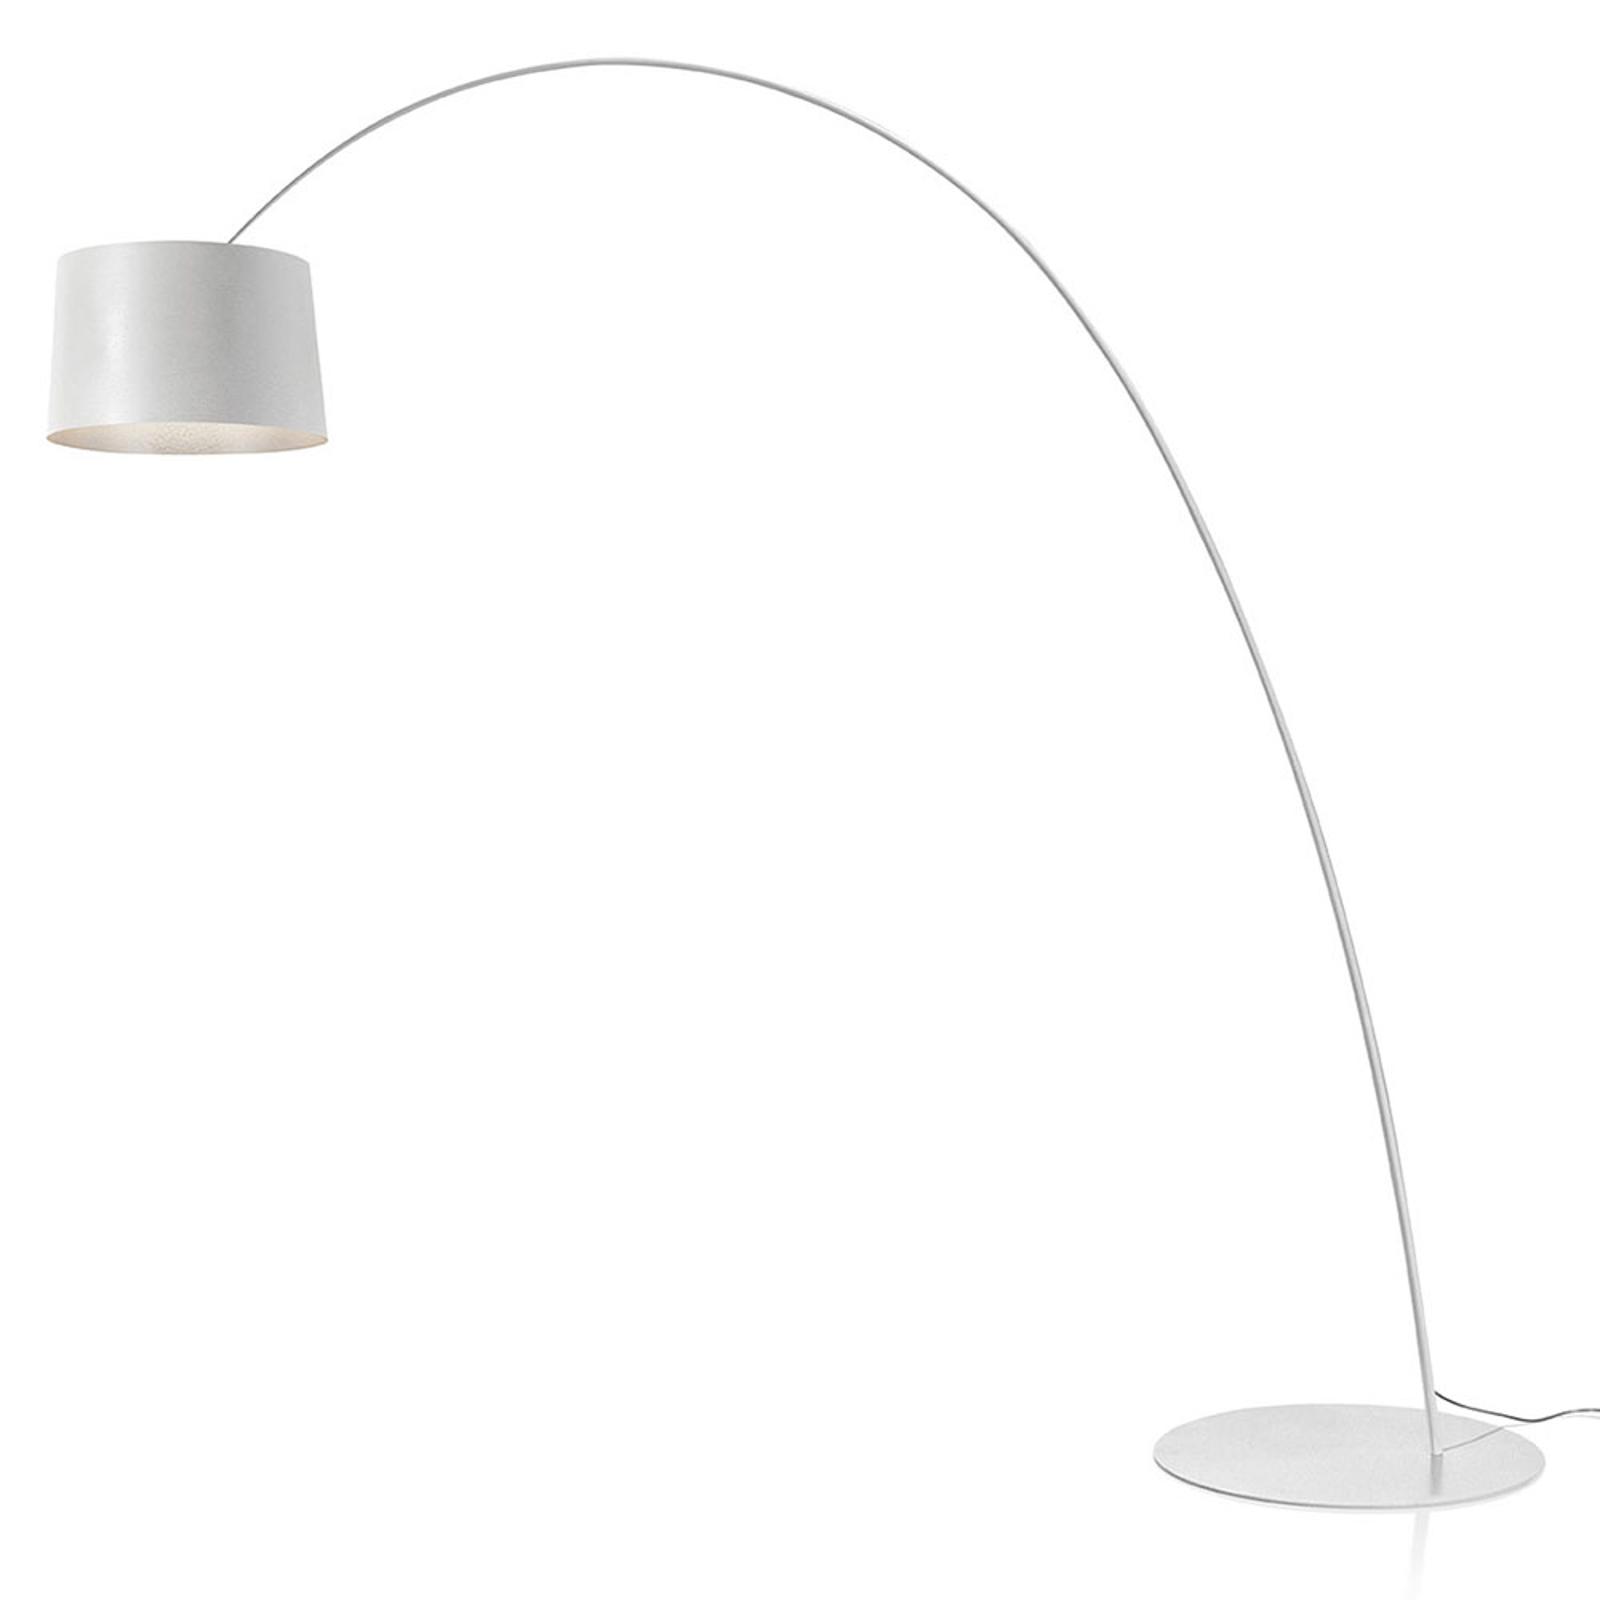 Foscarini Twiggy MyLight LED-gulvlampe hvit